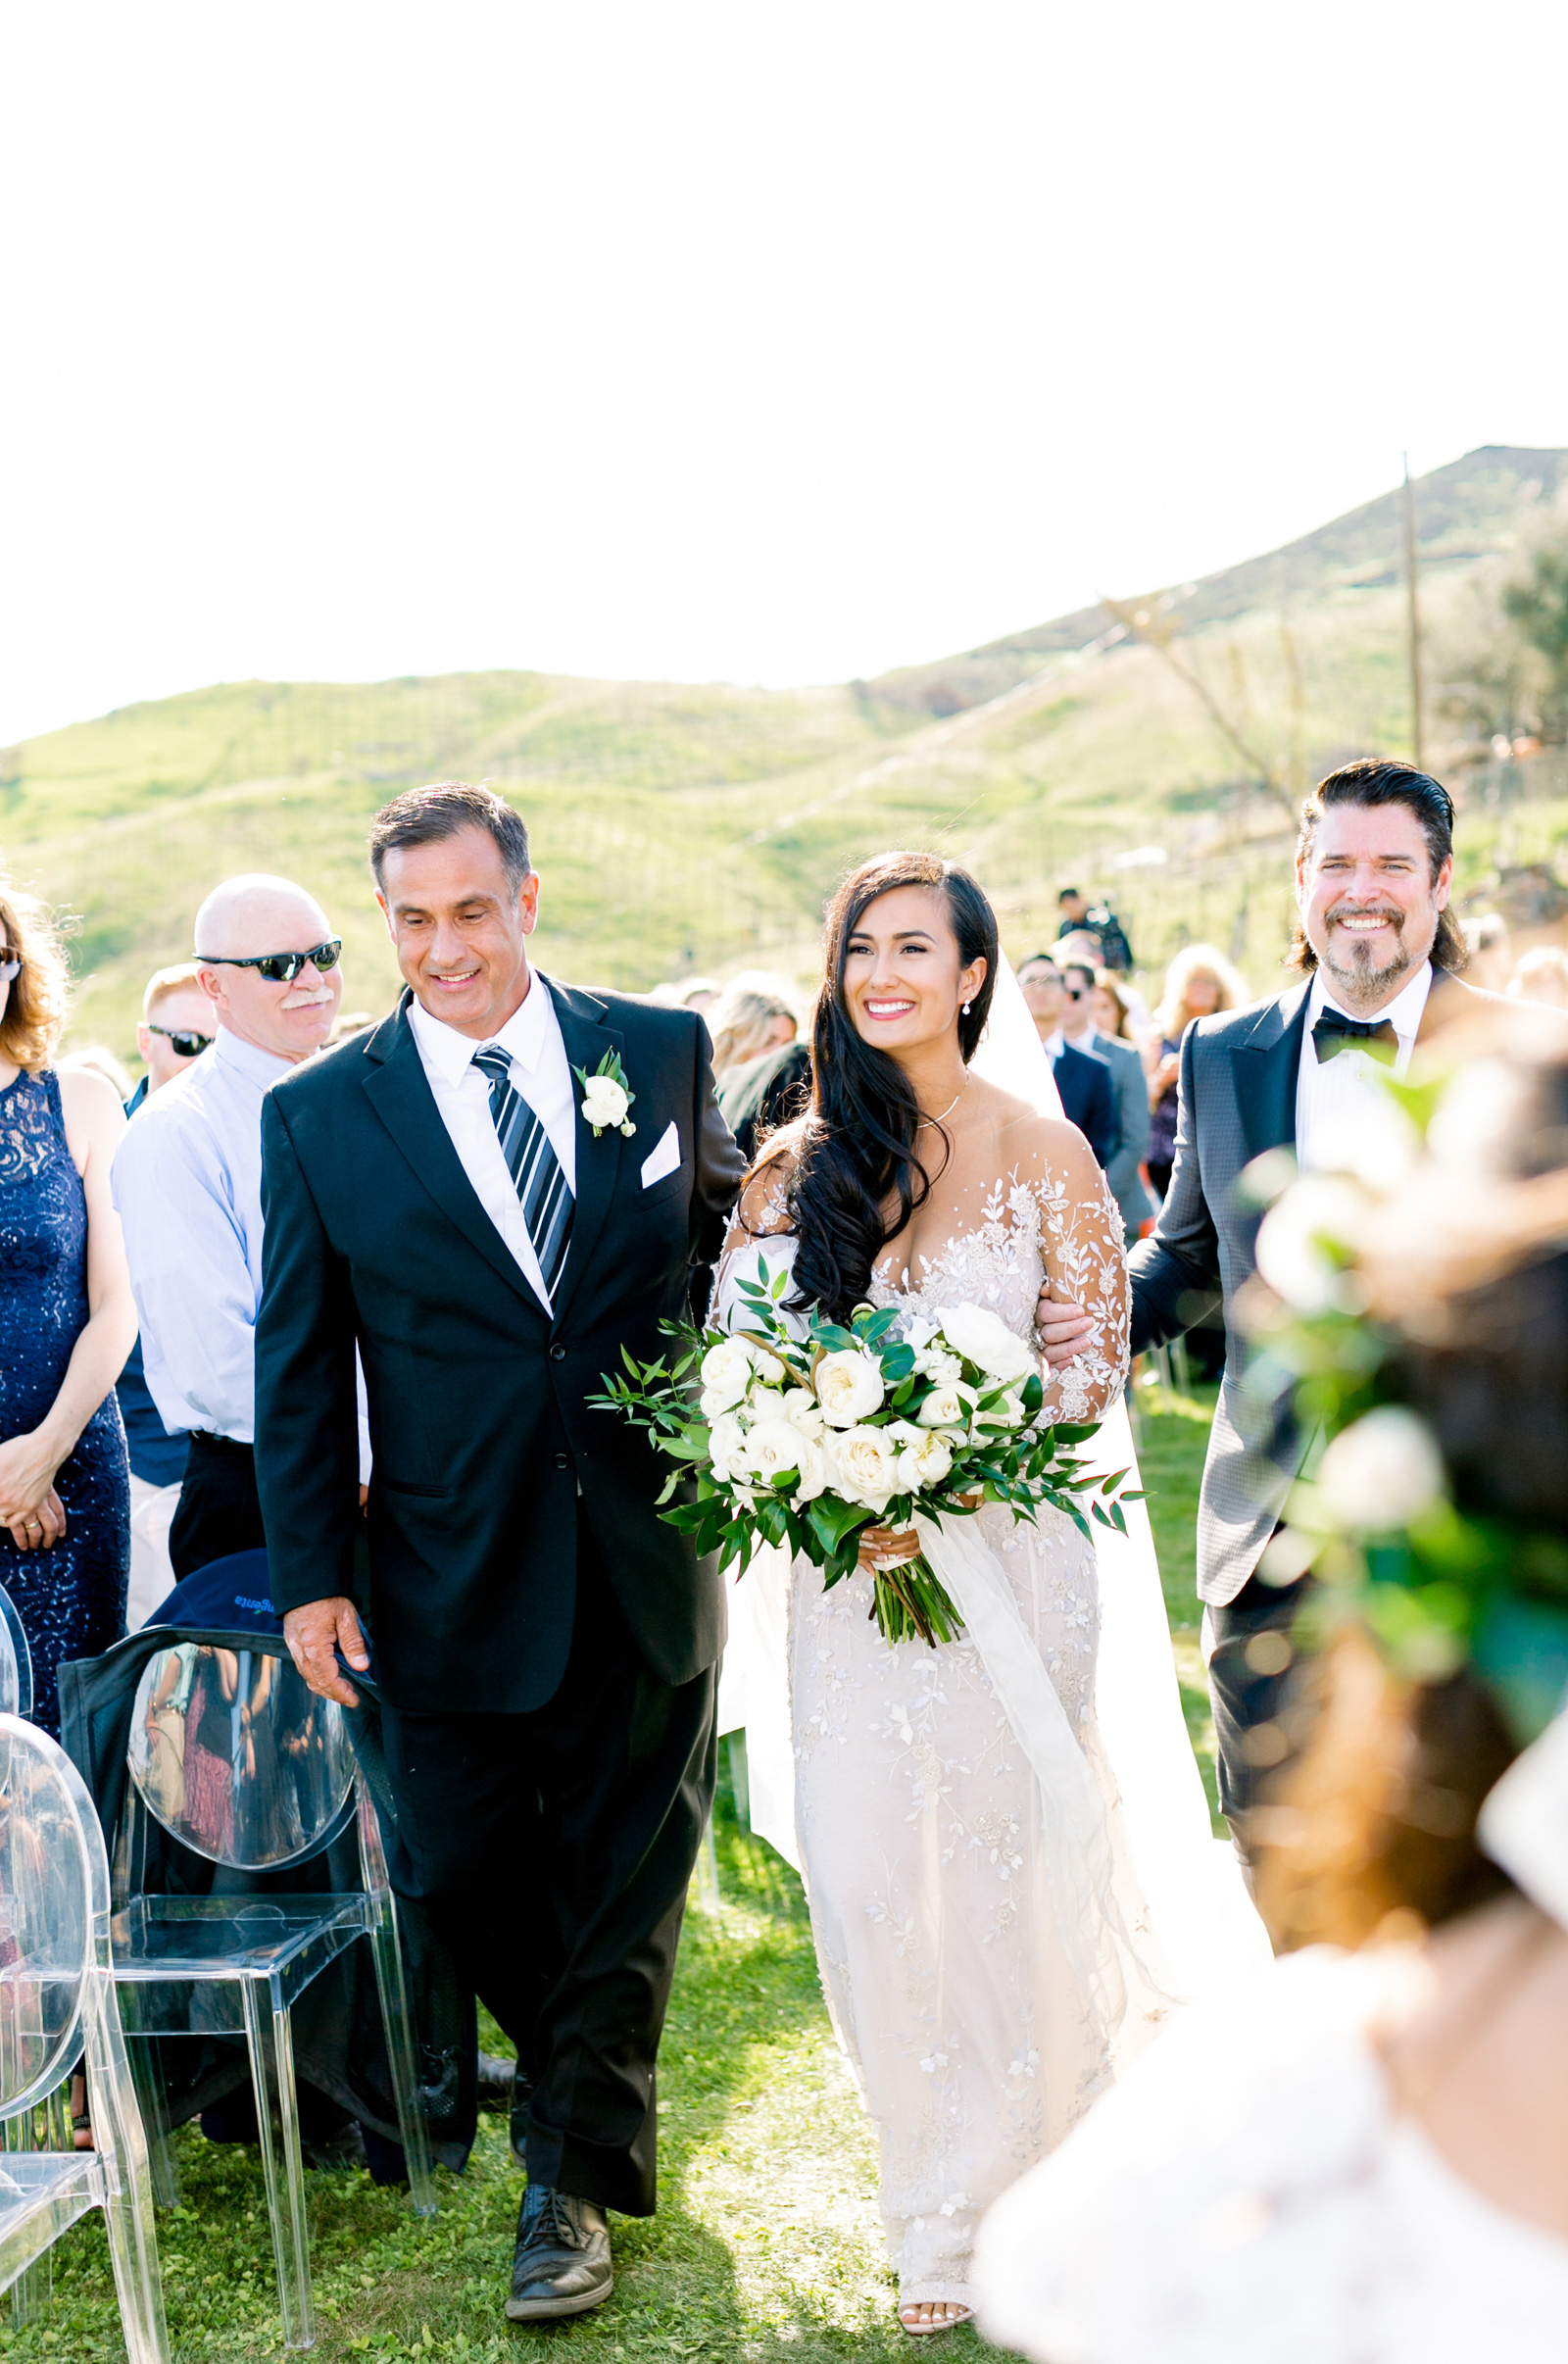 Southern-California-Wedding-Photographer-Natalie-Schutt-Photography-Style-Me-Pretty-Malibu-Rocky-Oaks-Photographer_10.jpg